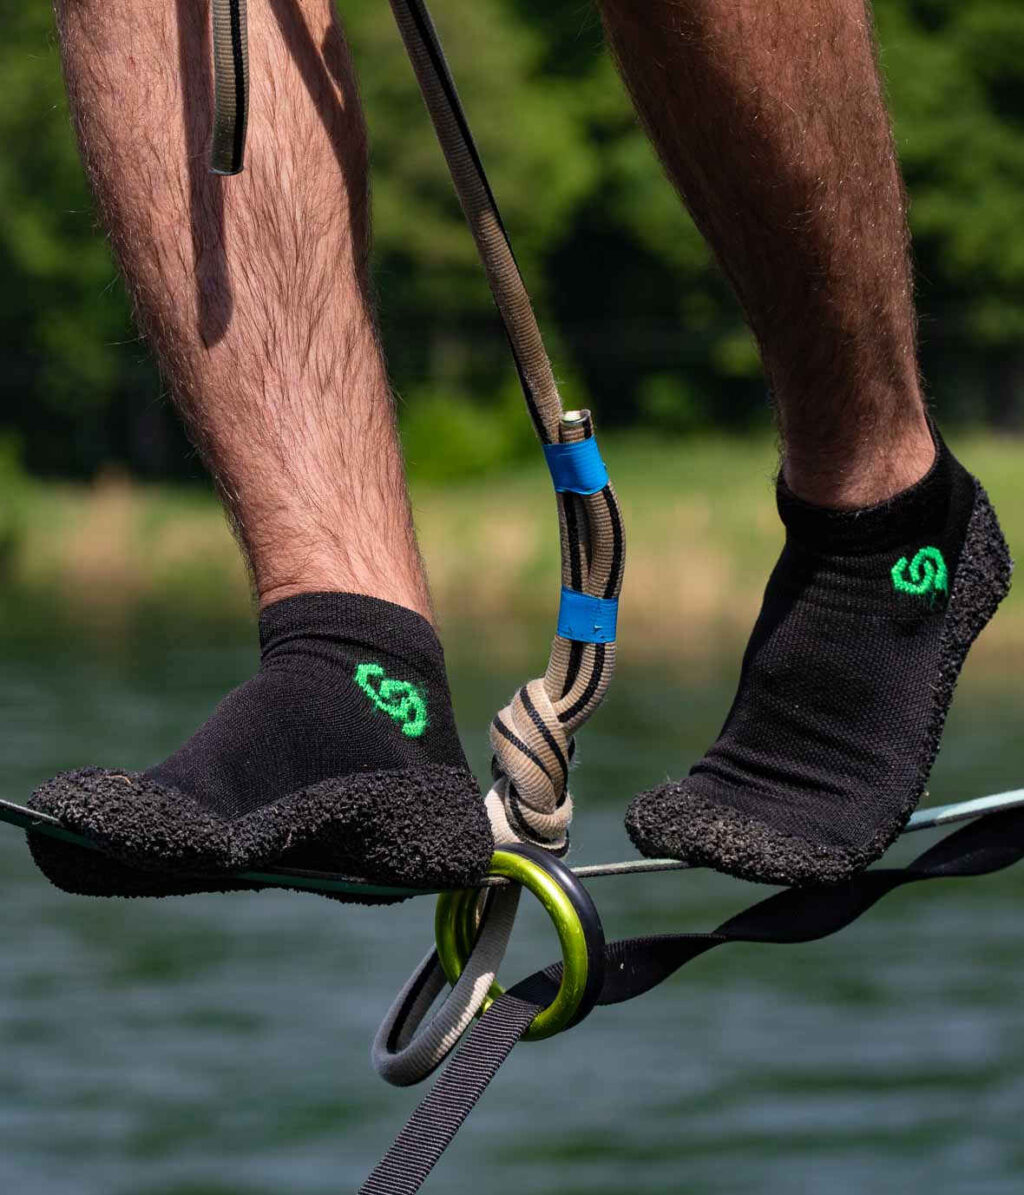 slackline shoes skinners